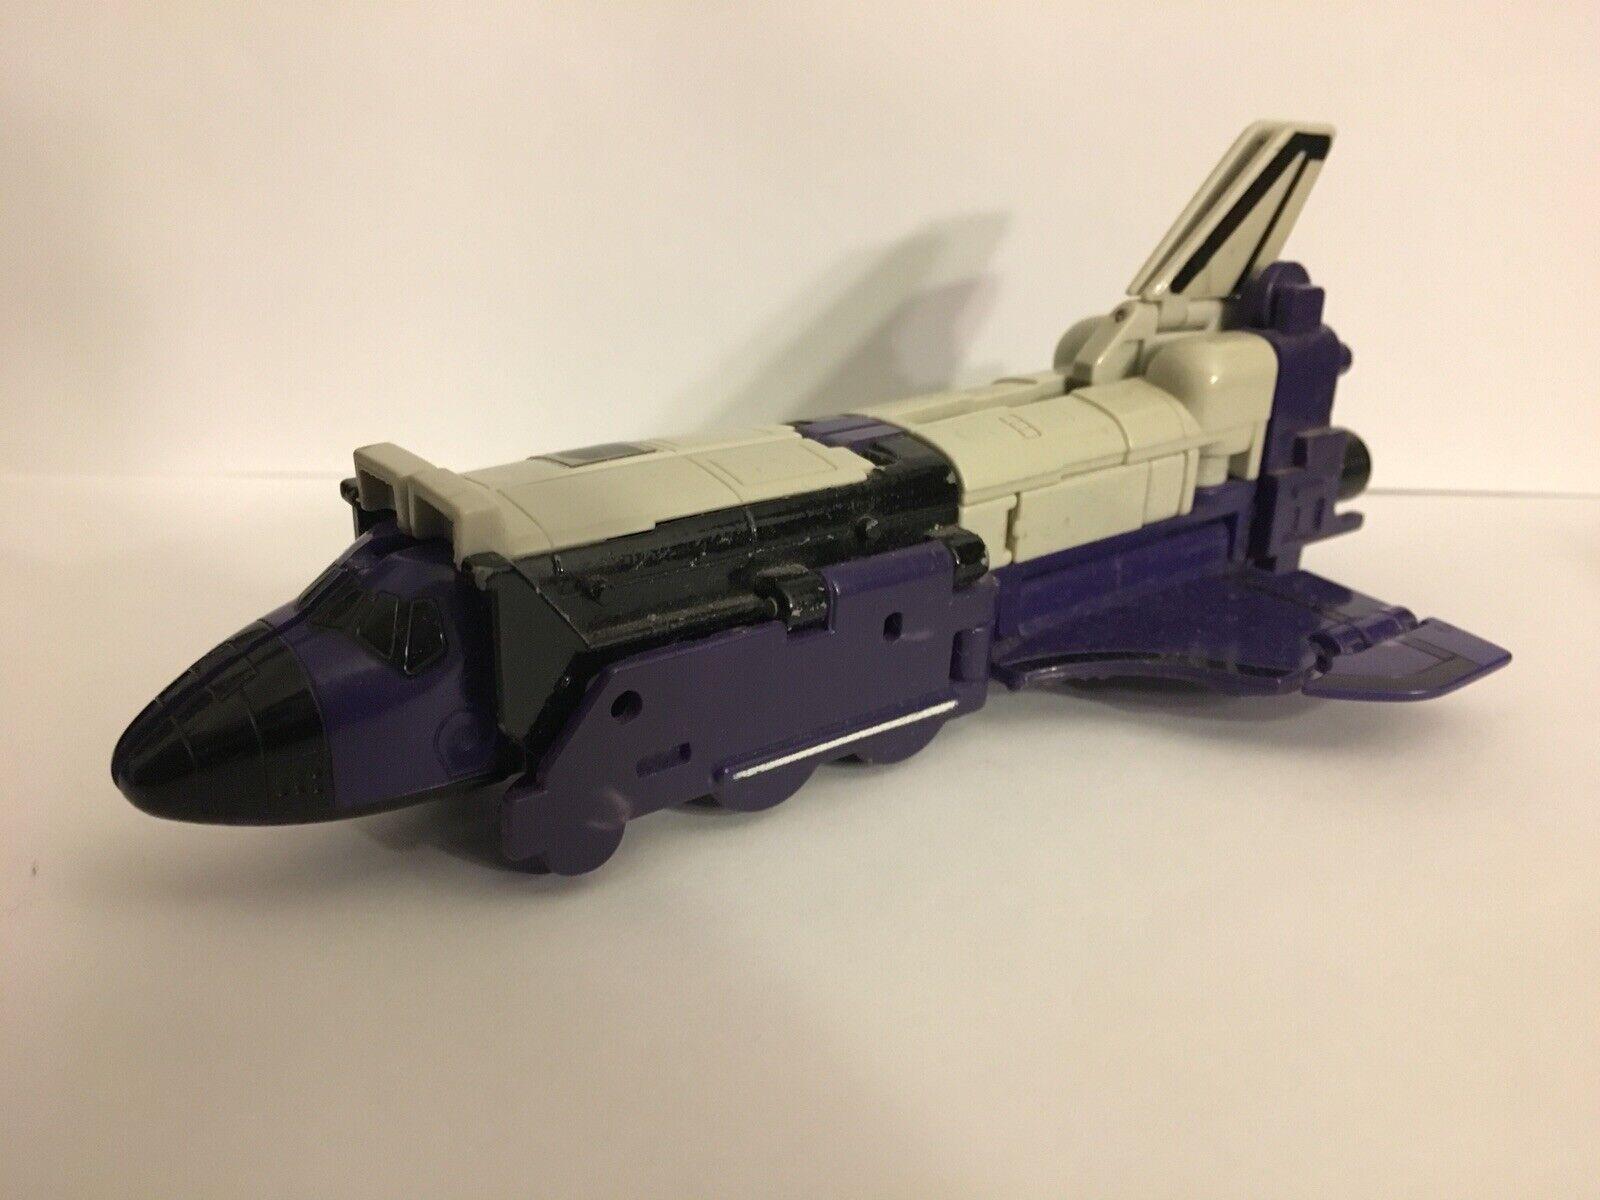 Astredrain Complete 1985 Vintage Hasbro G1 Transformers Action Figure